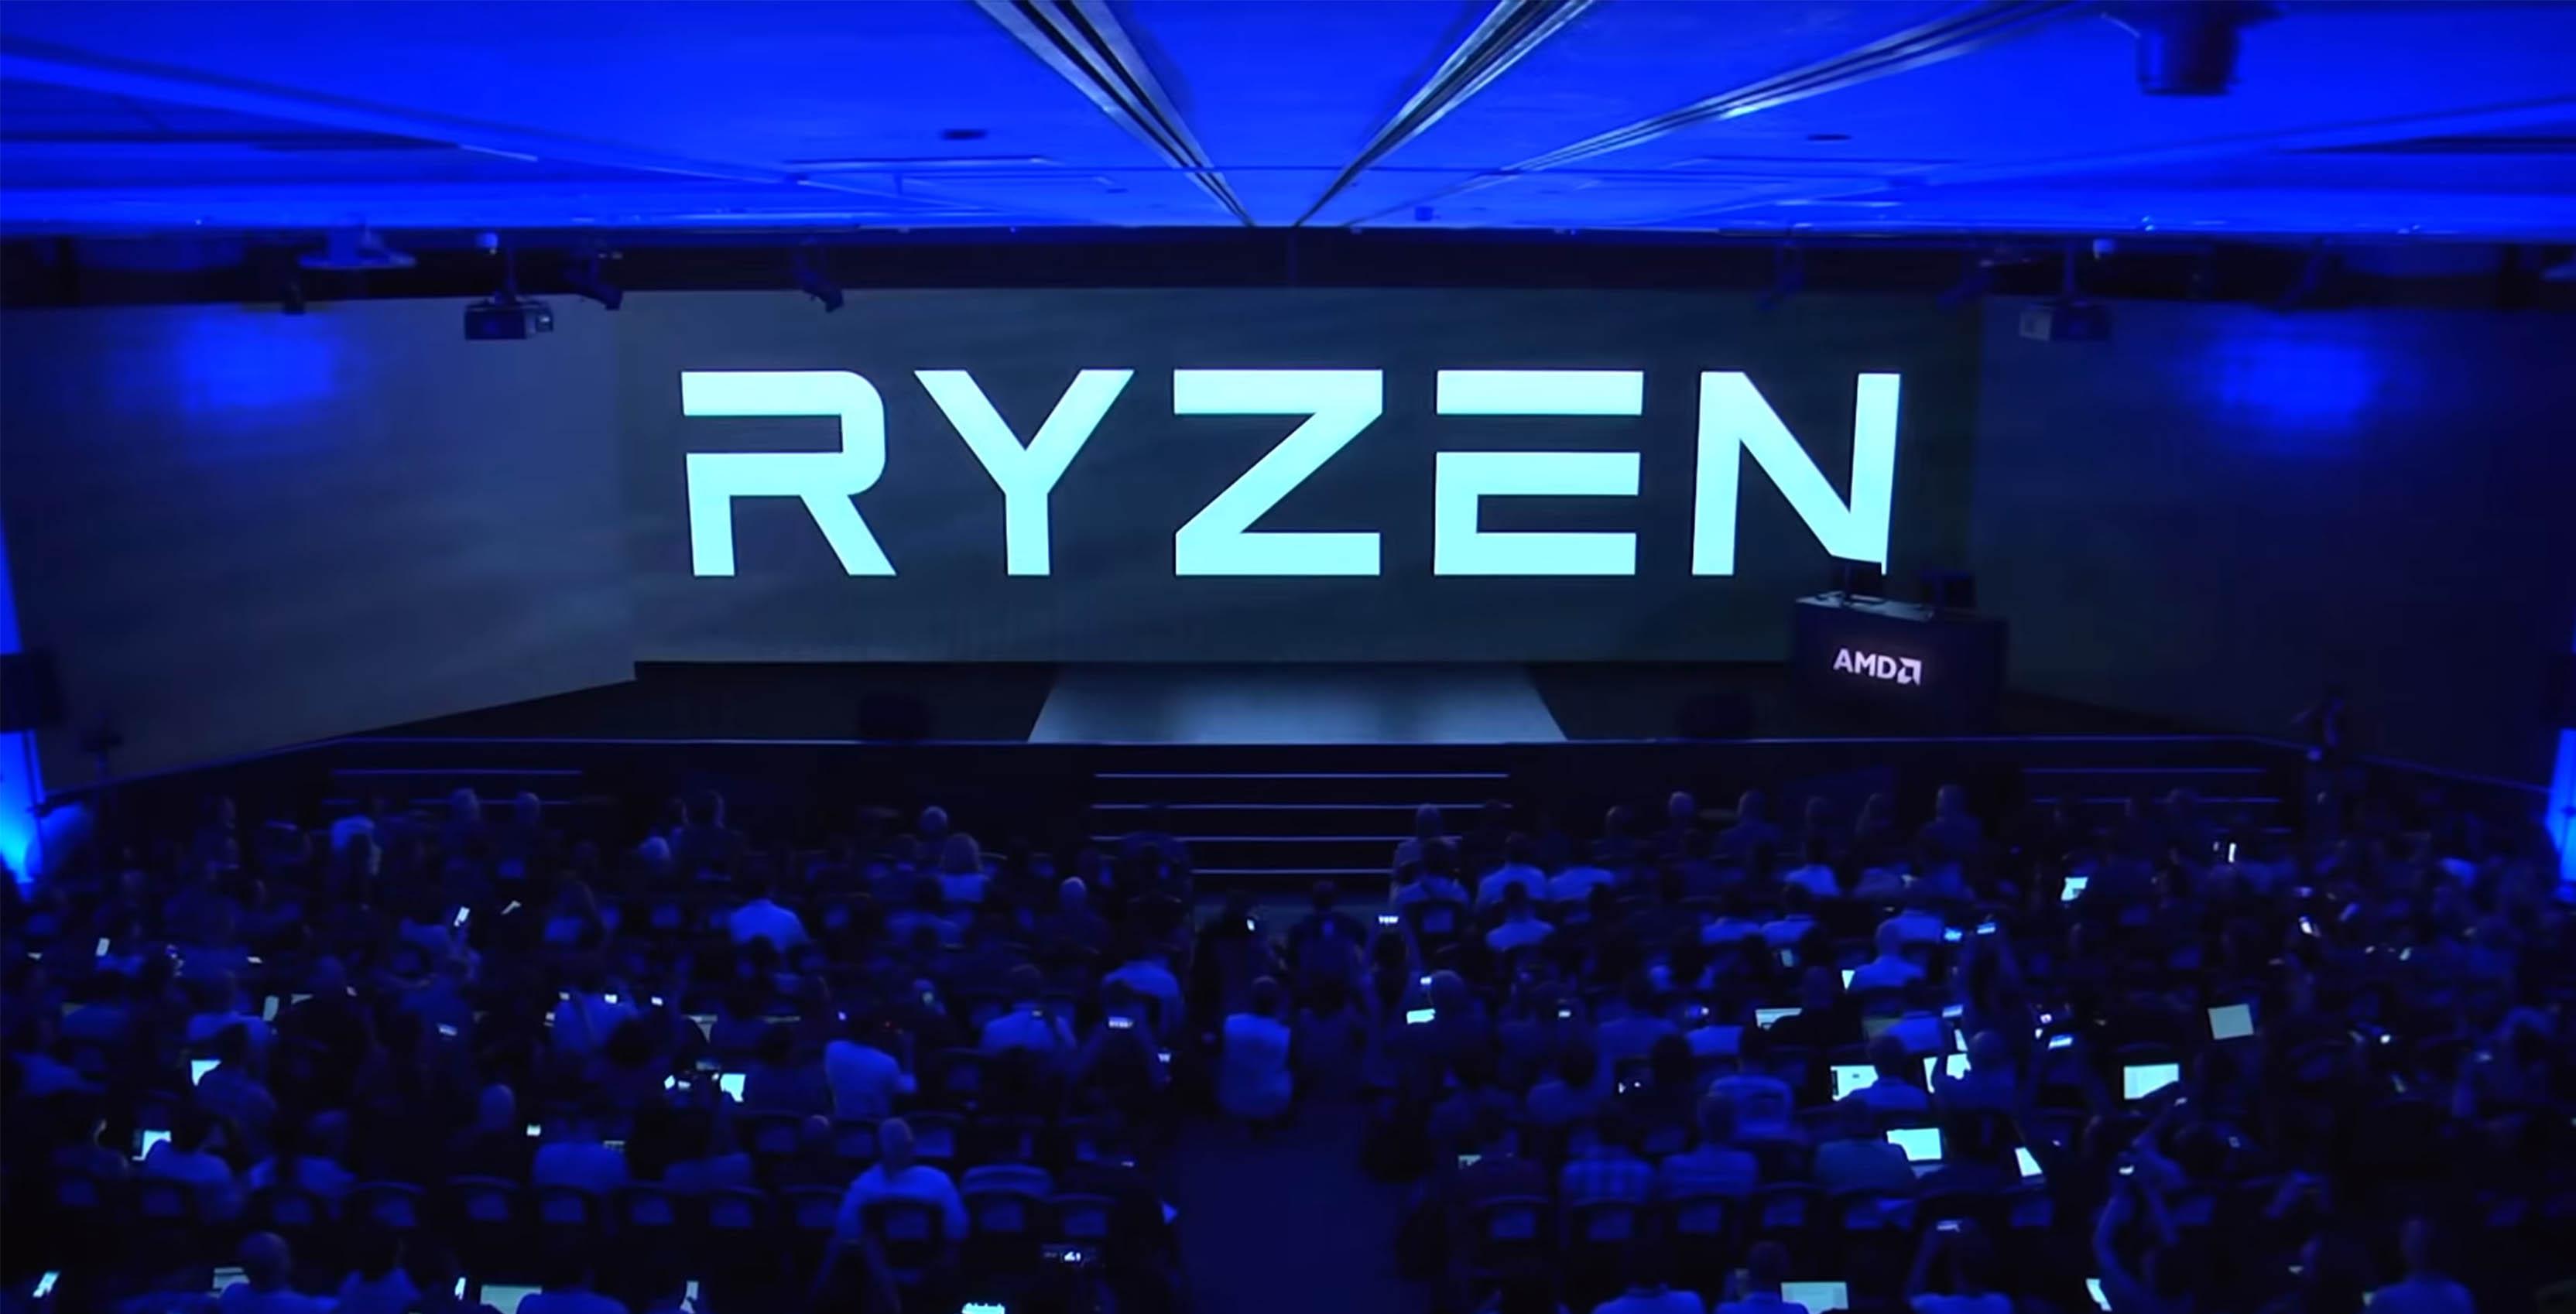 AMD Ryzen Computex 2019 announcement